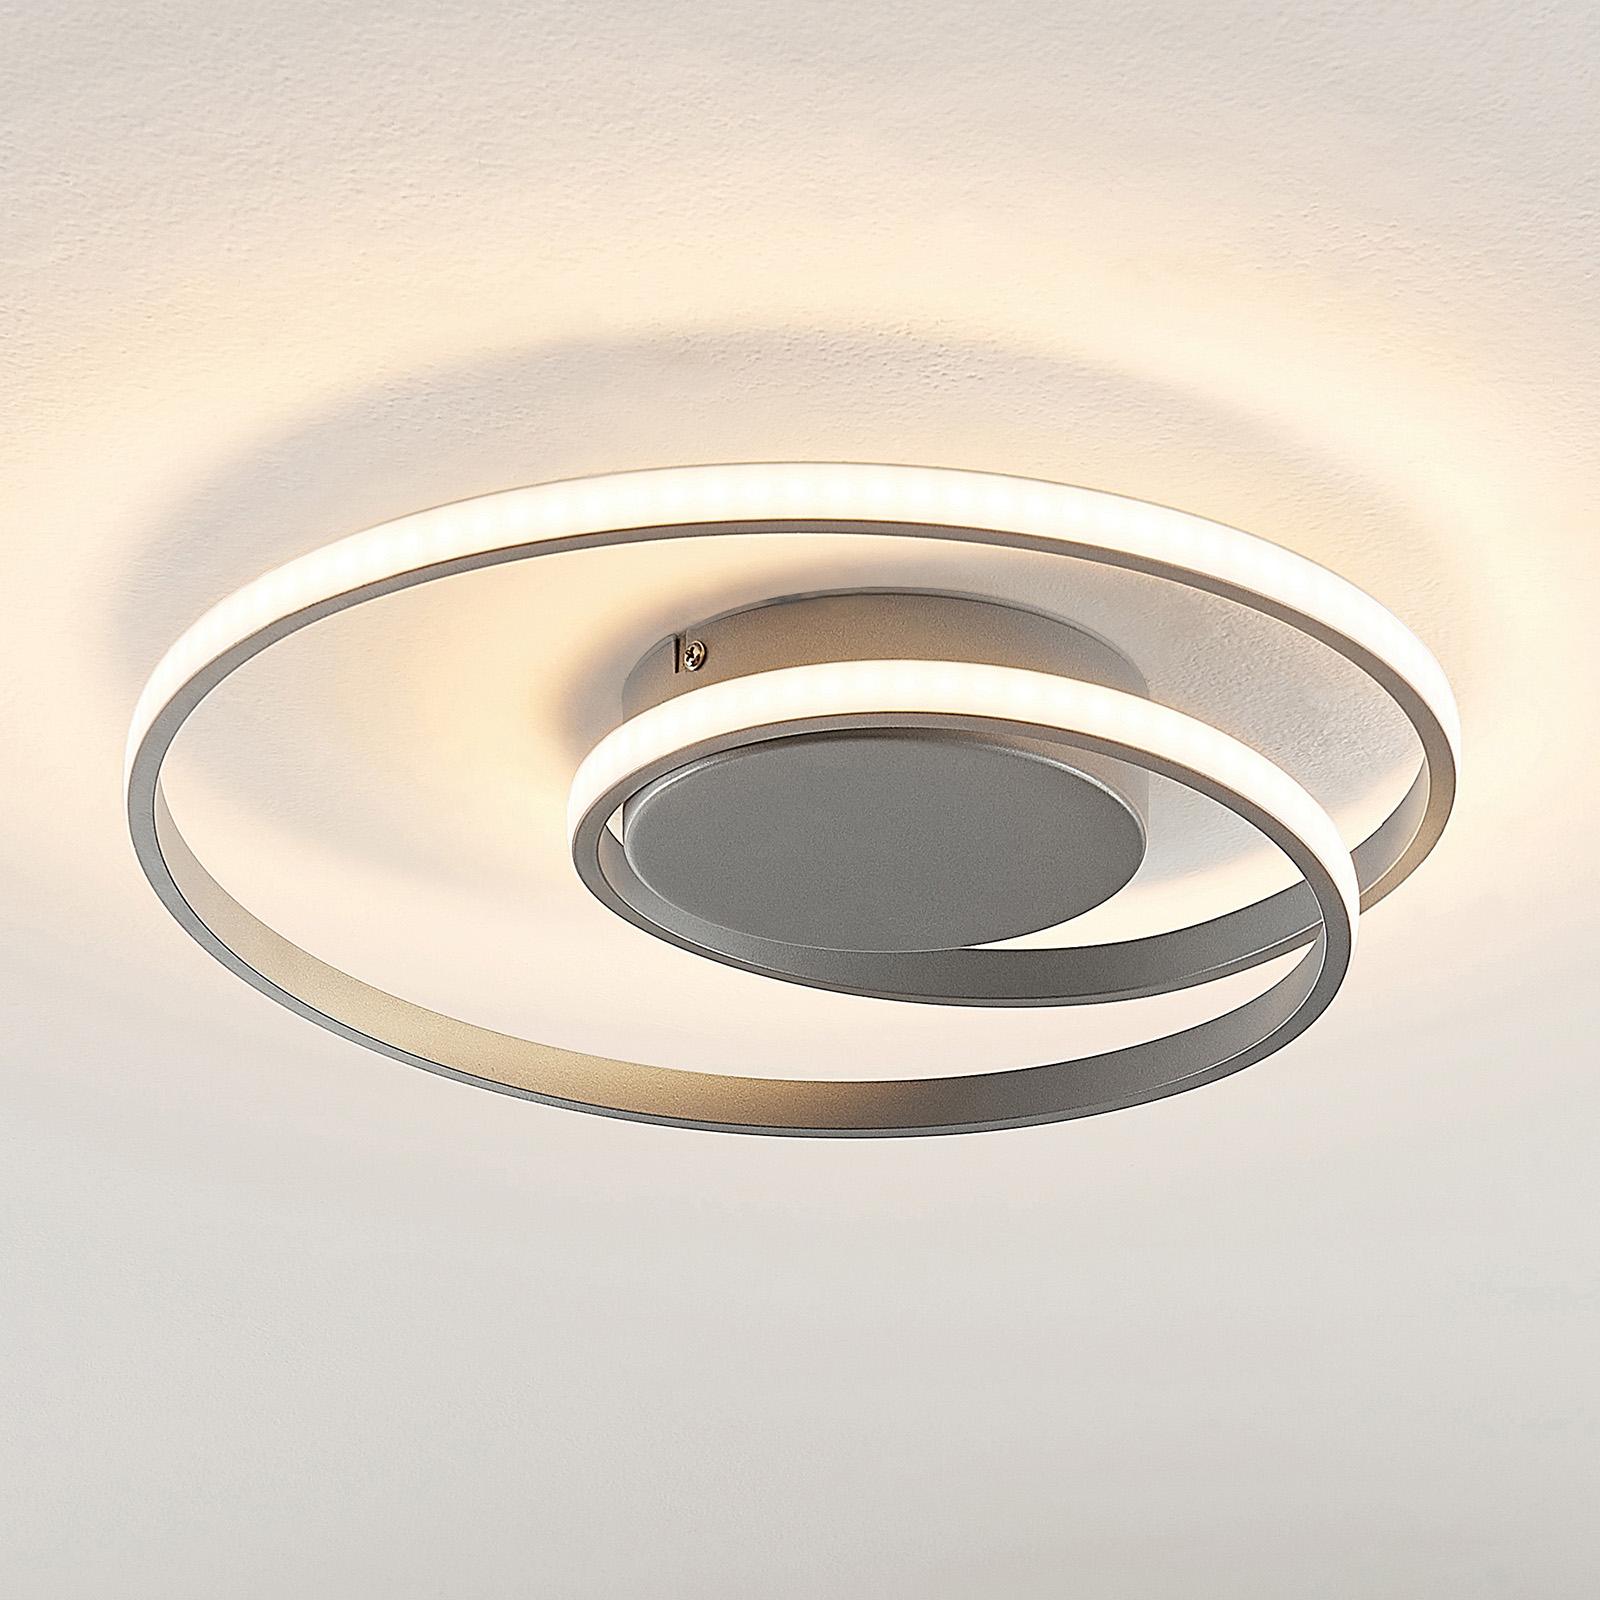 Lindby Kyron LED-Deckenlampe, silber titanfarbig